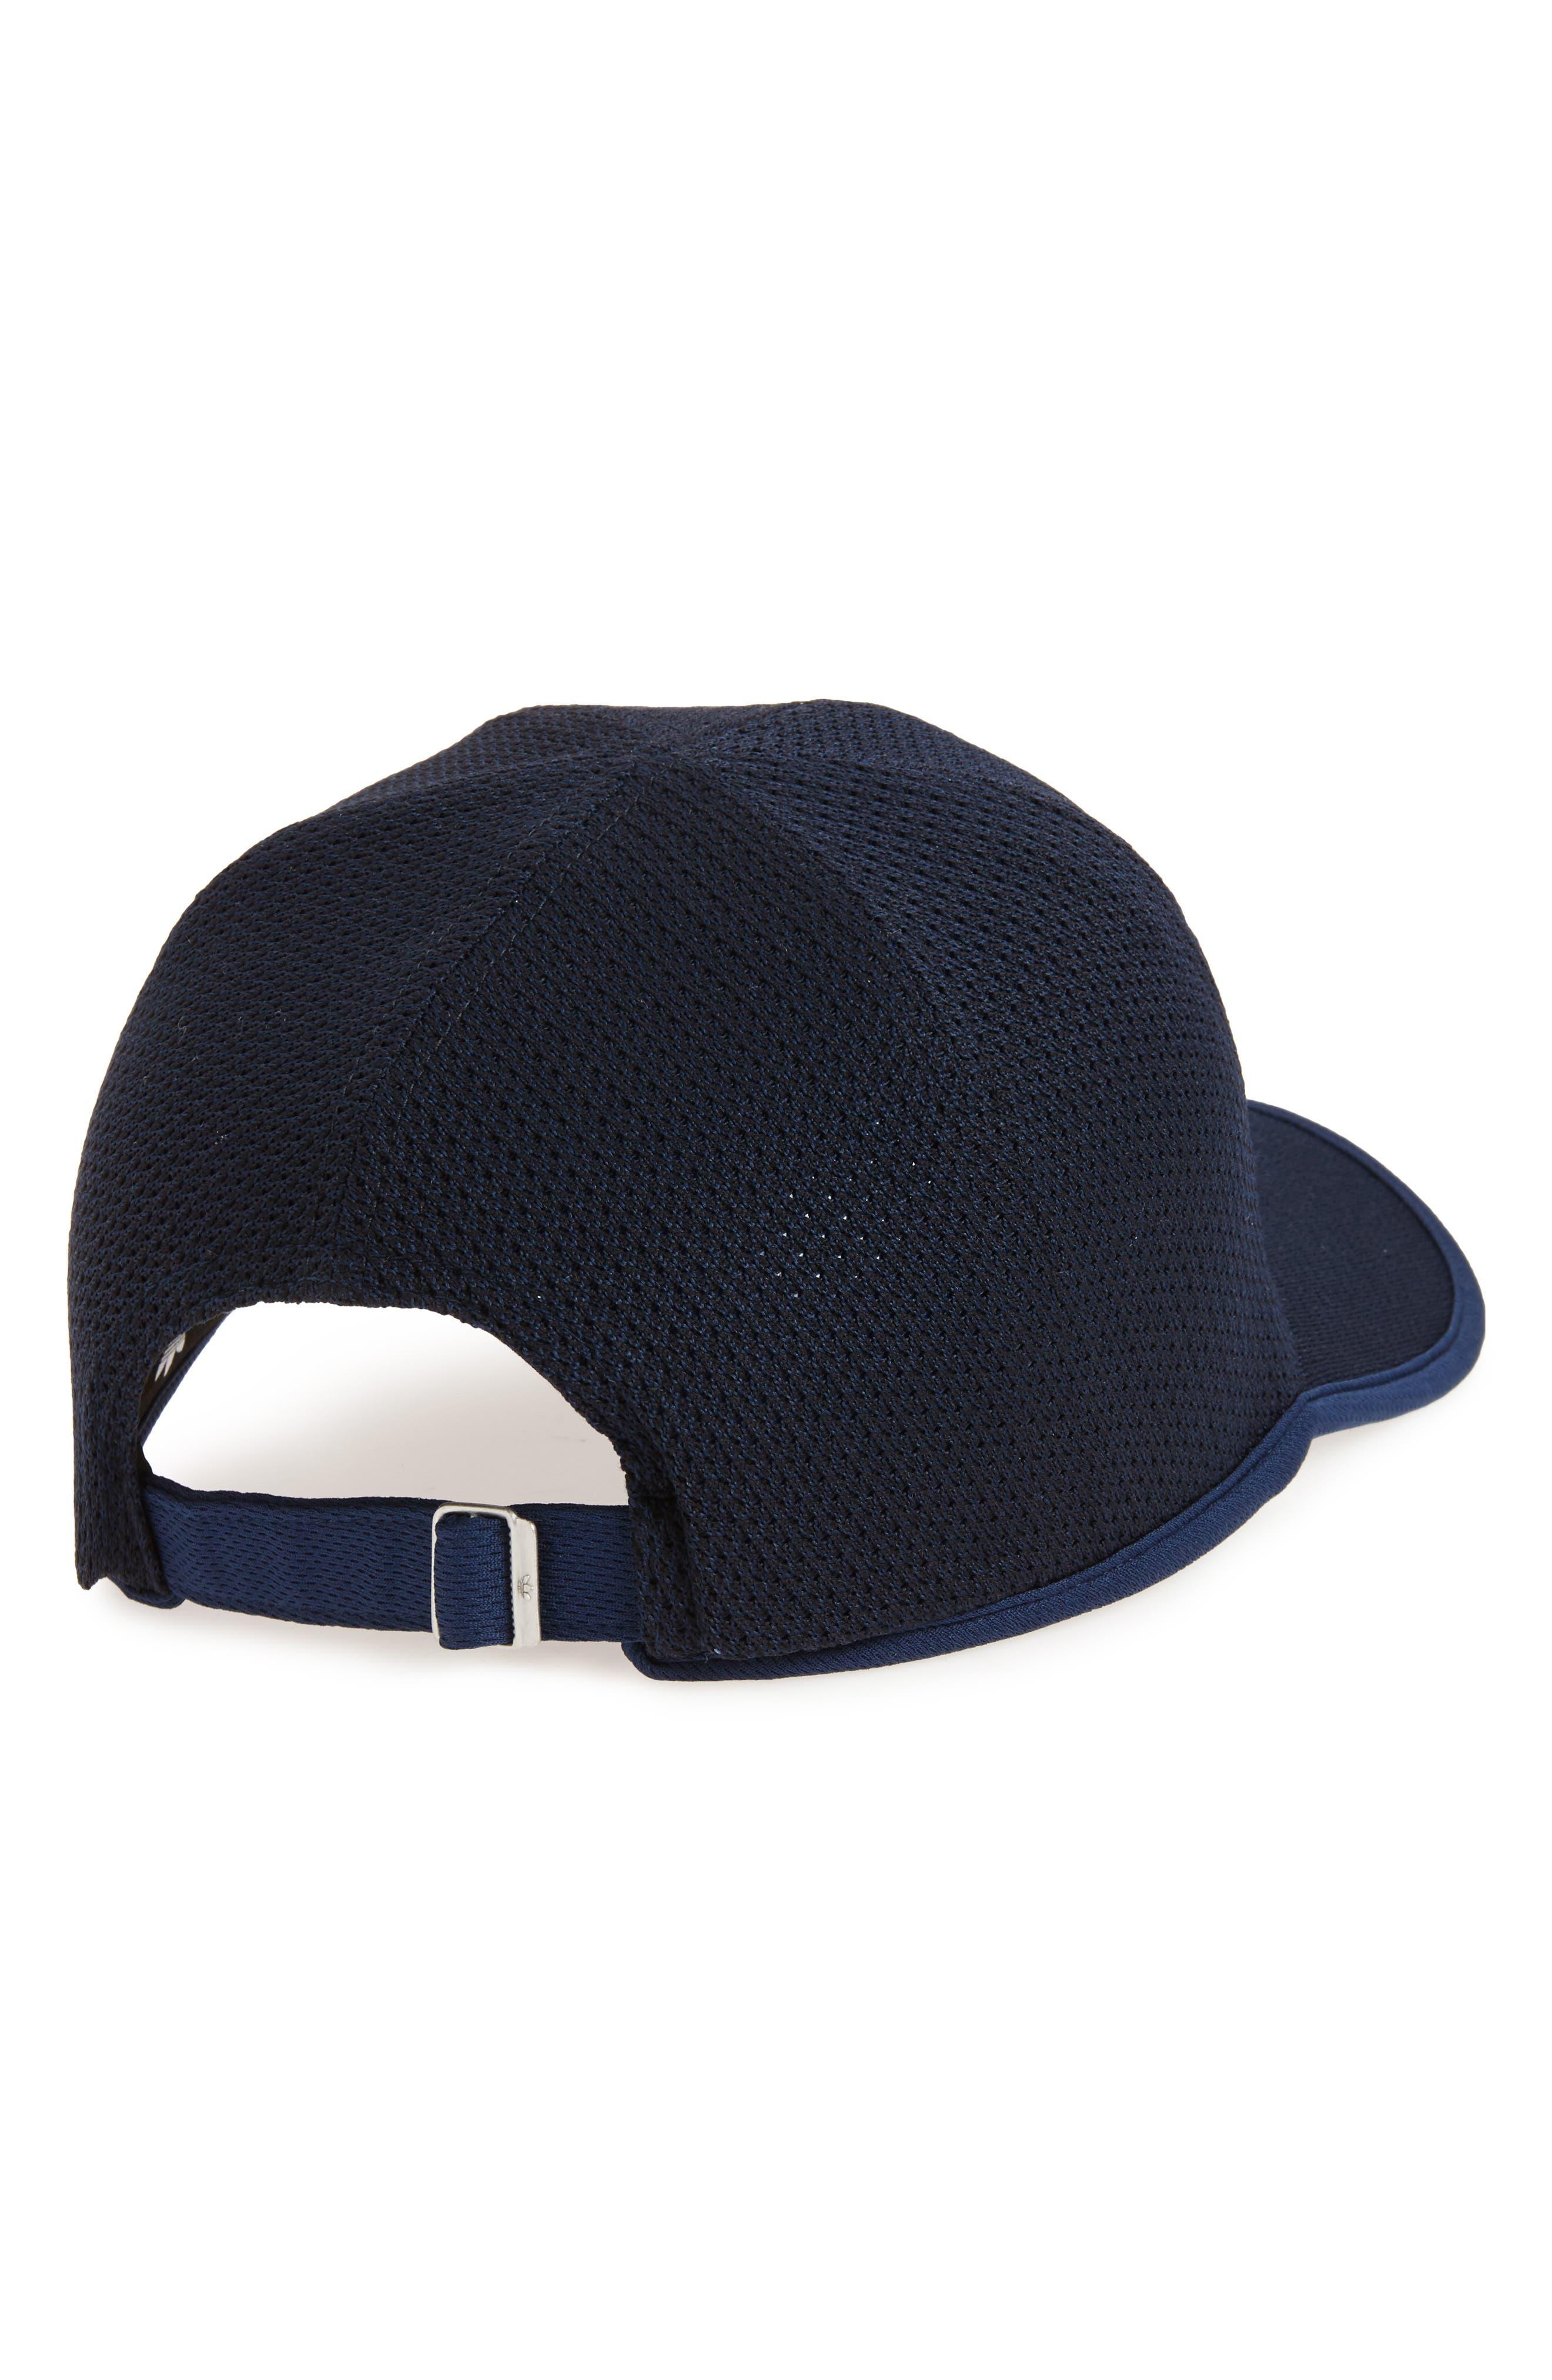 Prime Baseball Cap,                             Alternate thumbnail 8, color,